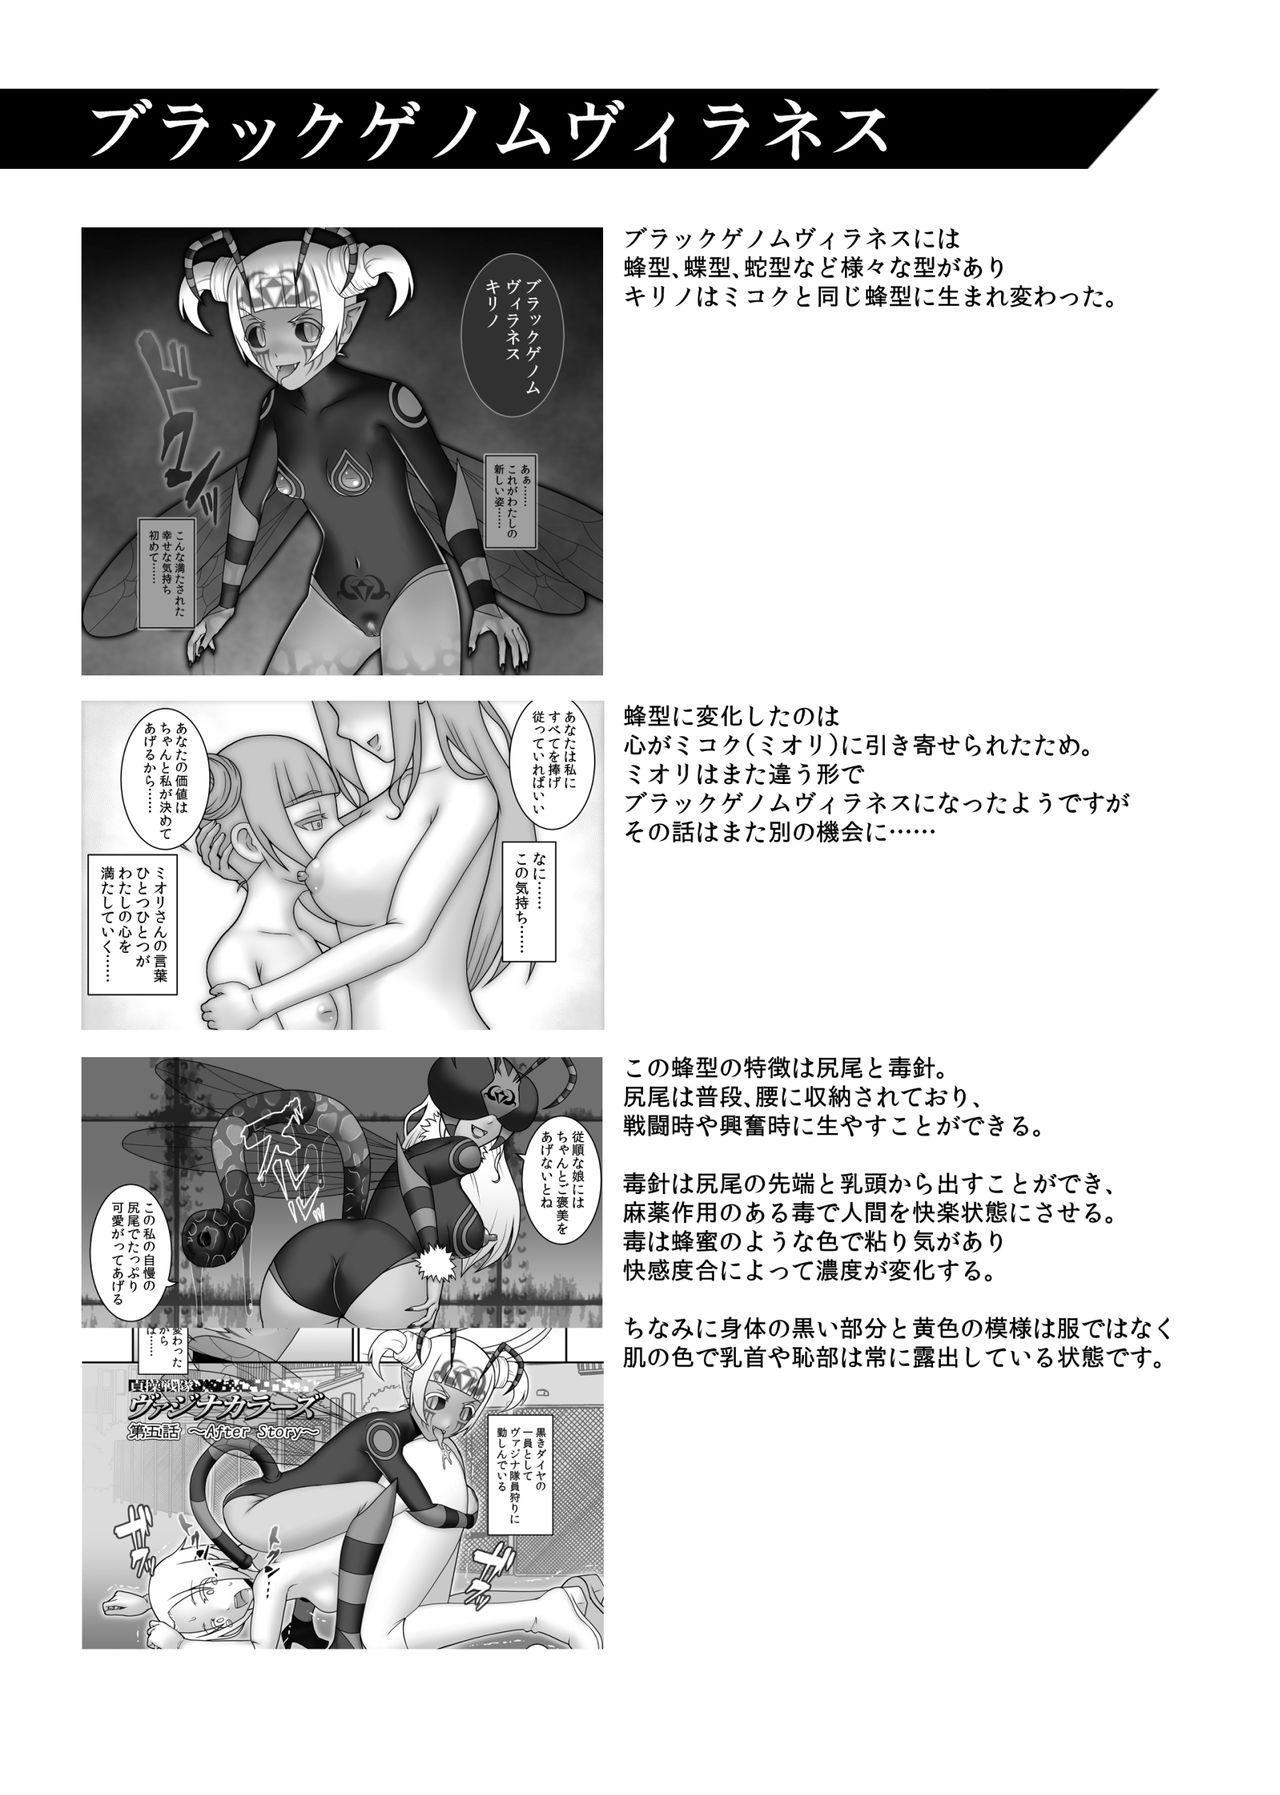 [STUDIO HP+ (IceLee)] Teisou Sentai Virginal Colors Dai-Go-wa 43